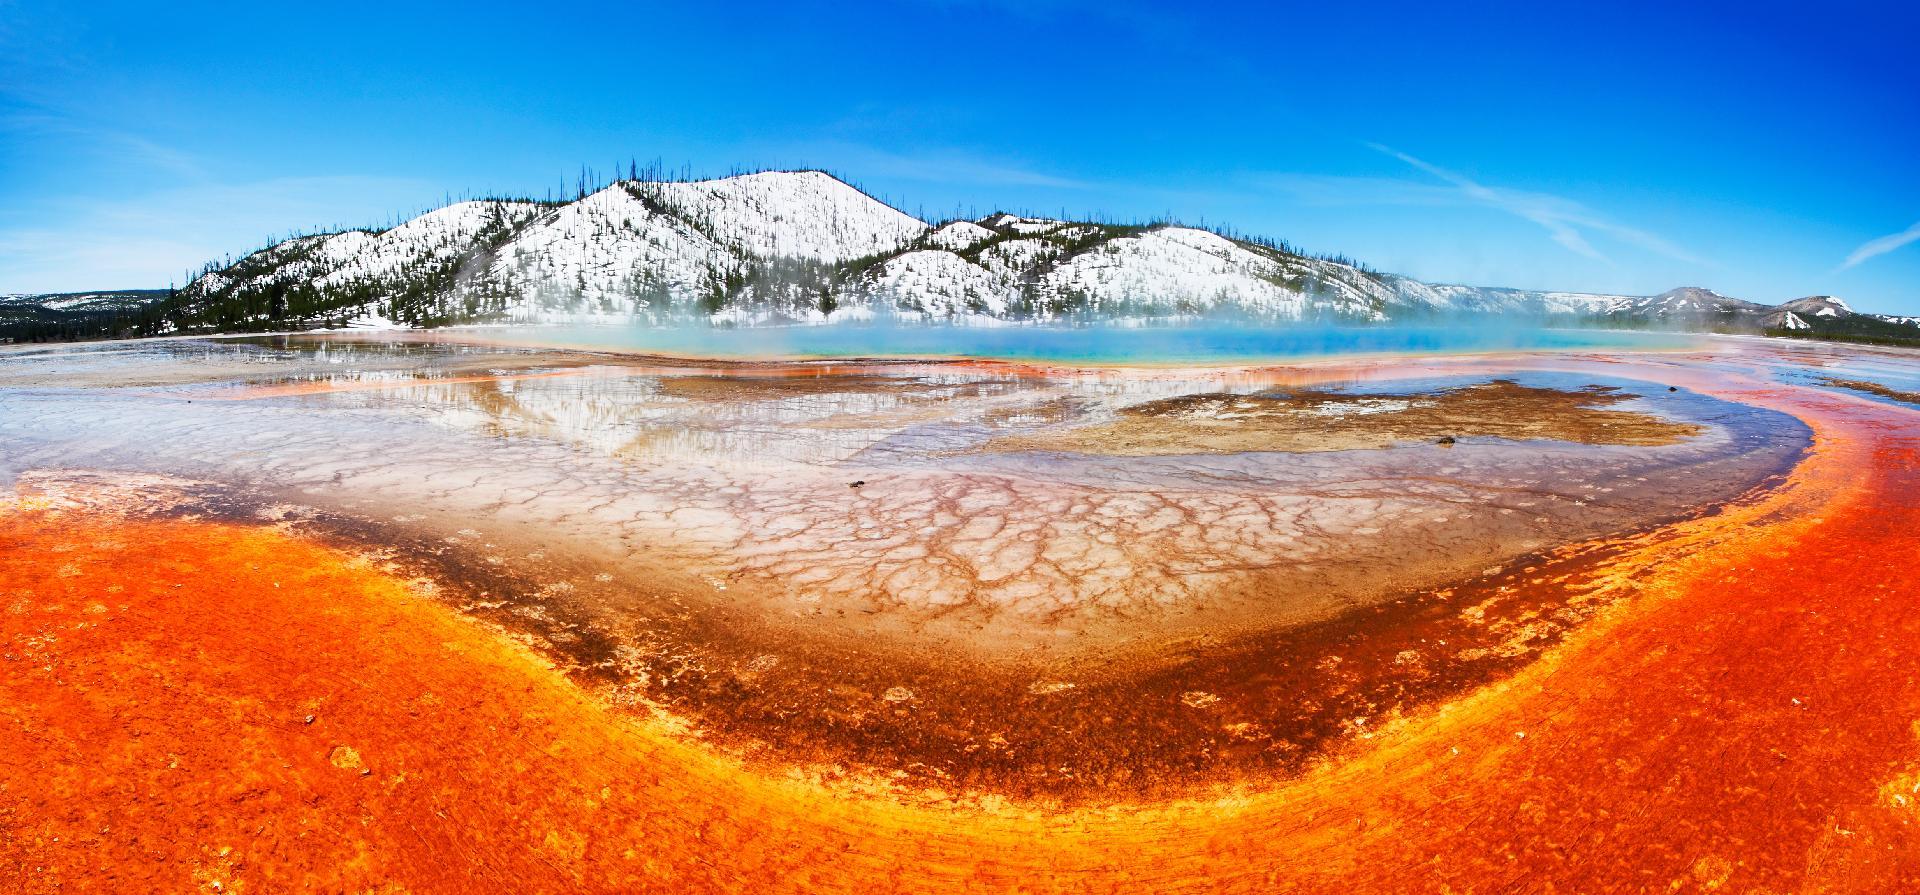 Foto - Vzhůru do Yellowstonu